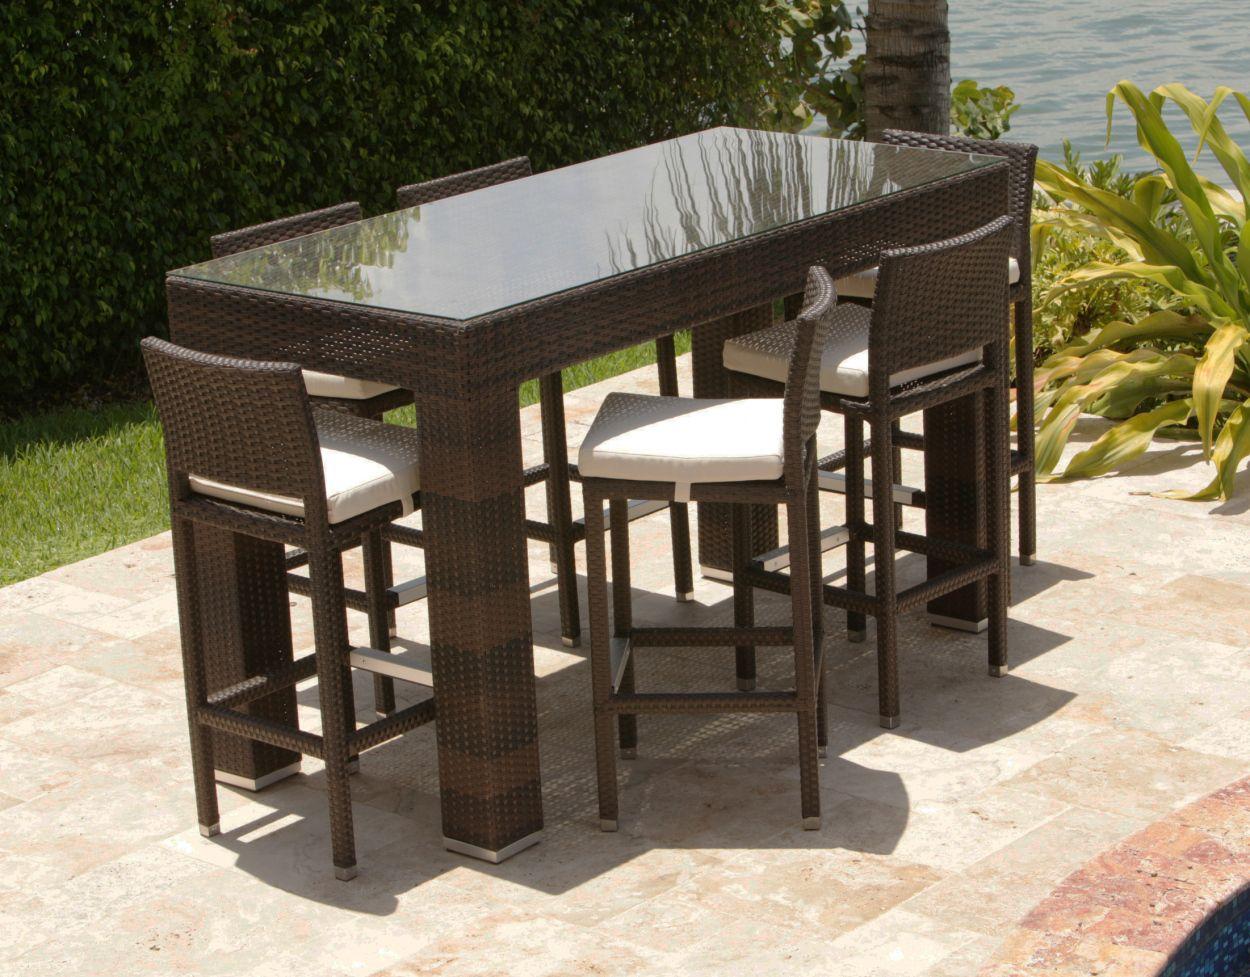 Patio furniture bar stools cool apartment furniture check more at http searchfororangecountyhomes